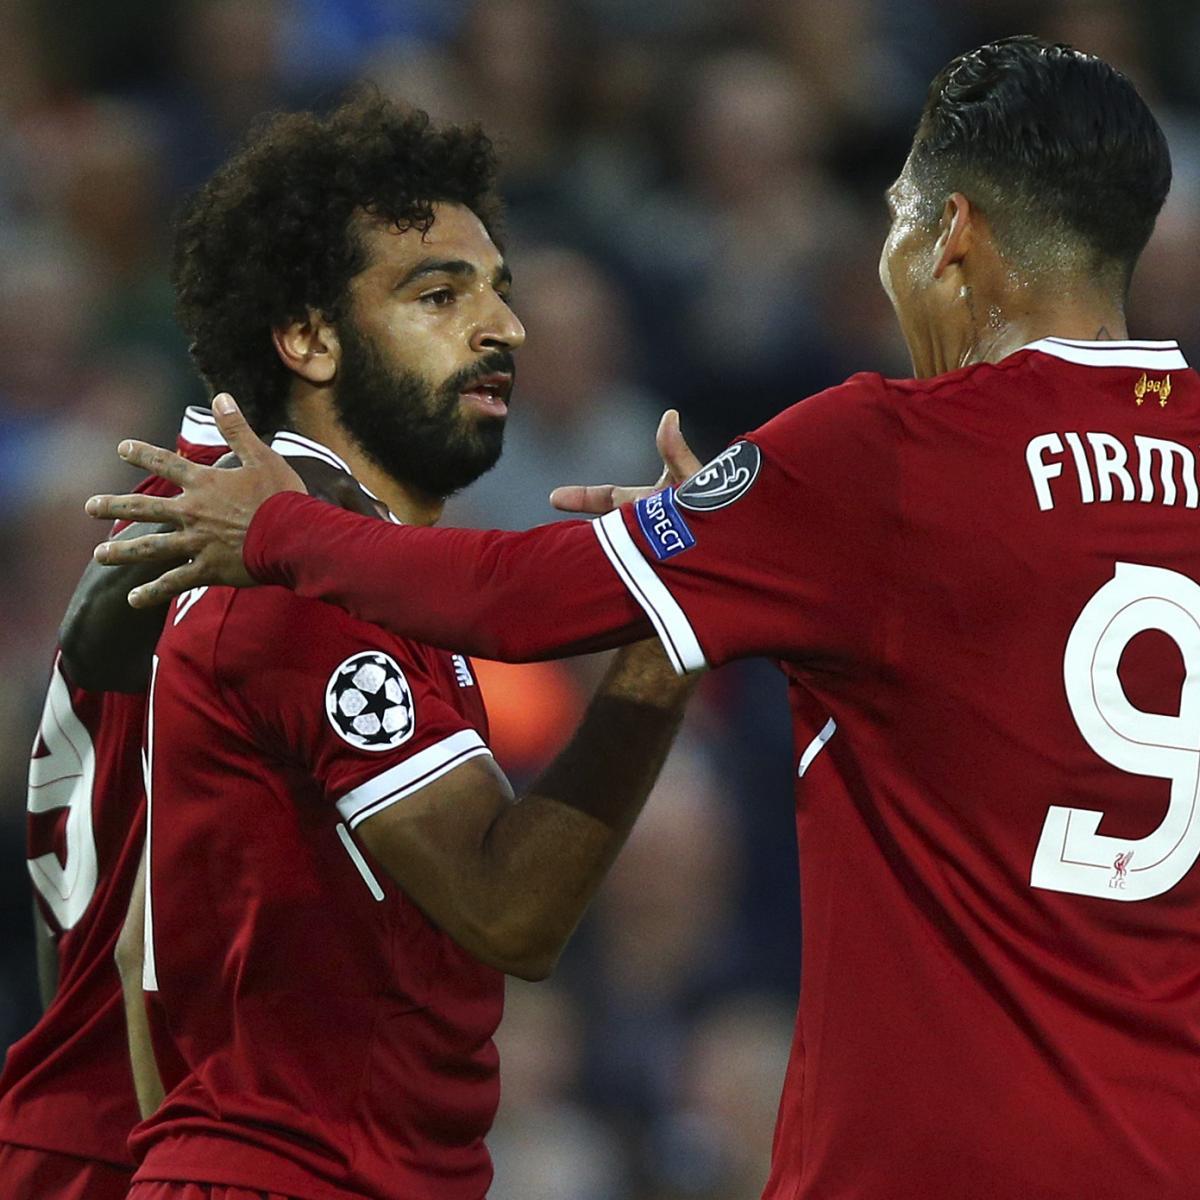 Champions League 2019 Round Of 16 Leg 2 Live Stream Tv: Liverpool Vs. Porto: Preview, Live Stream, TV Info For UCL